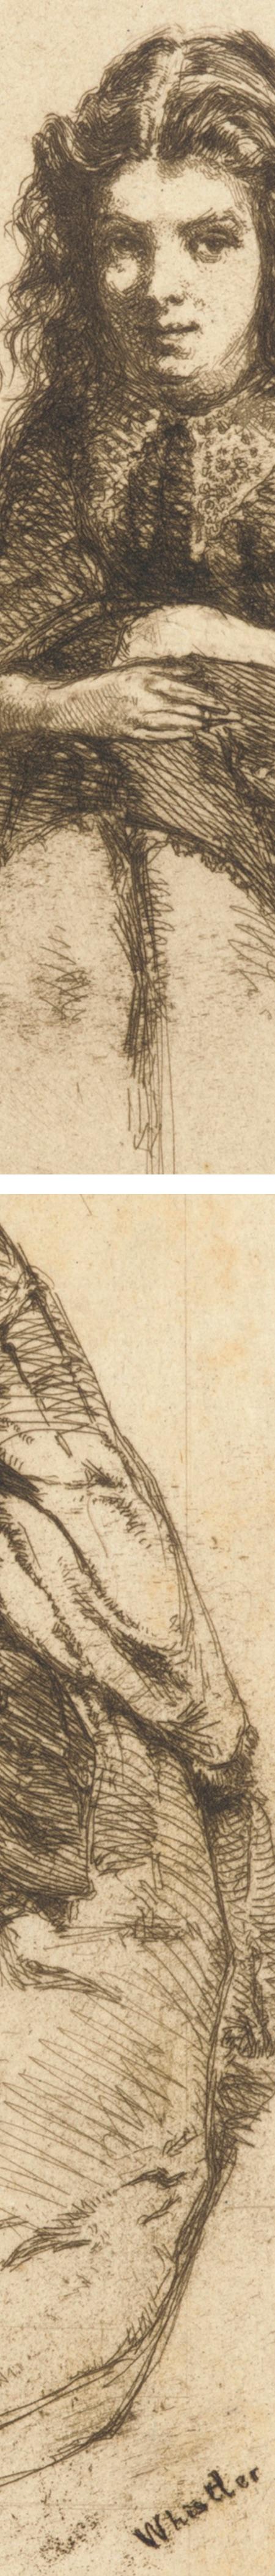 Fumette, etching whistler (details)